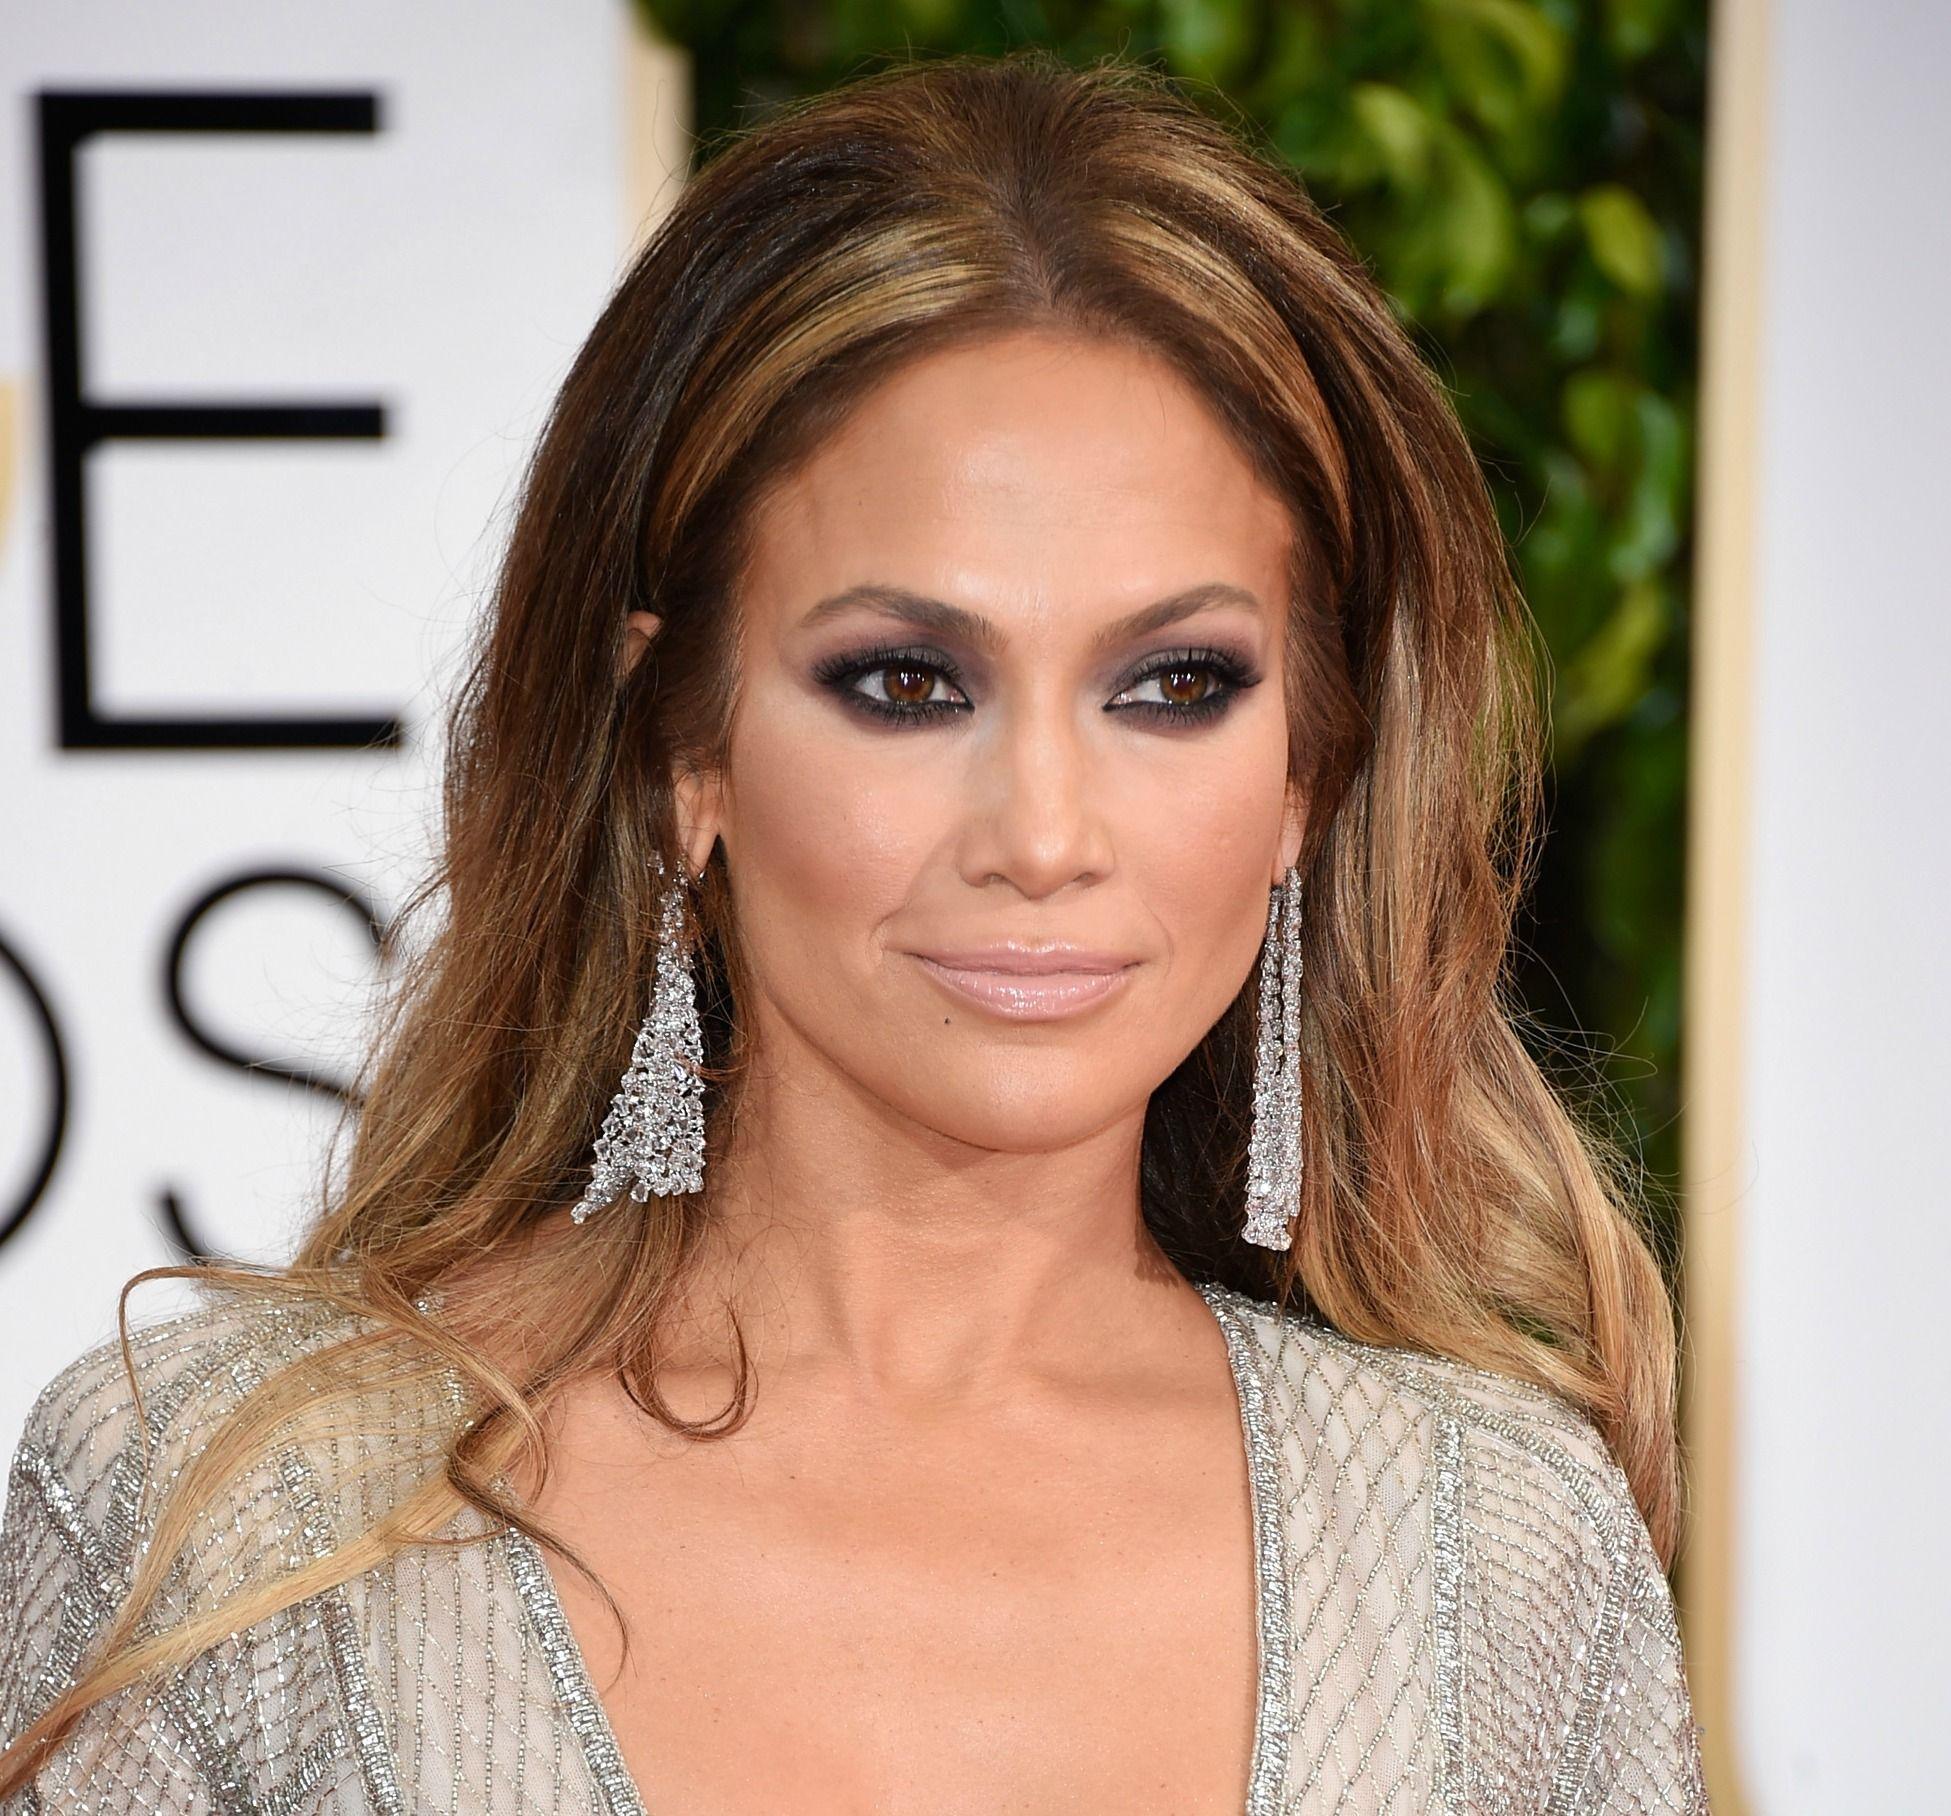 Beauty Products Jlo: Golden Globes 2015 – Minhas Favoritas